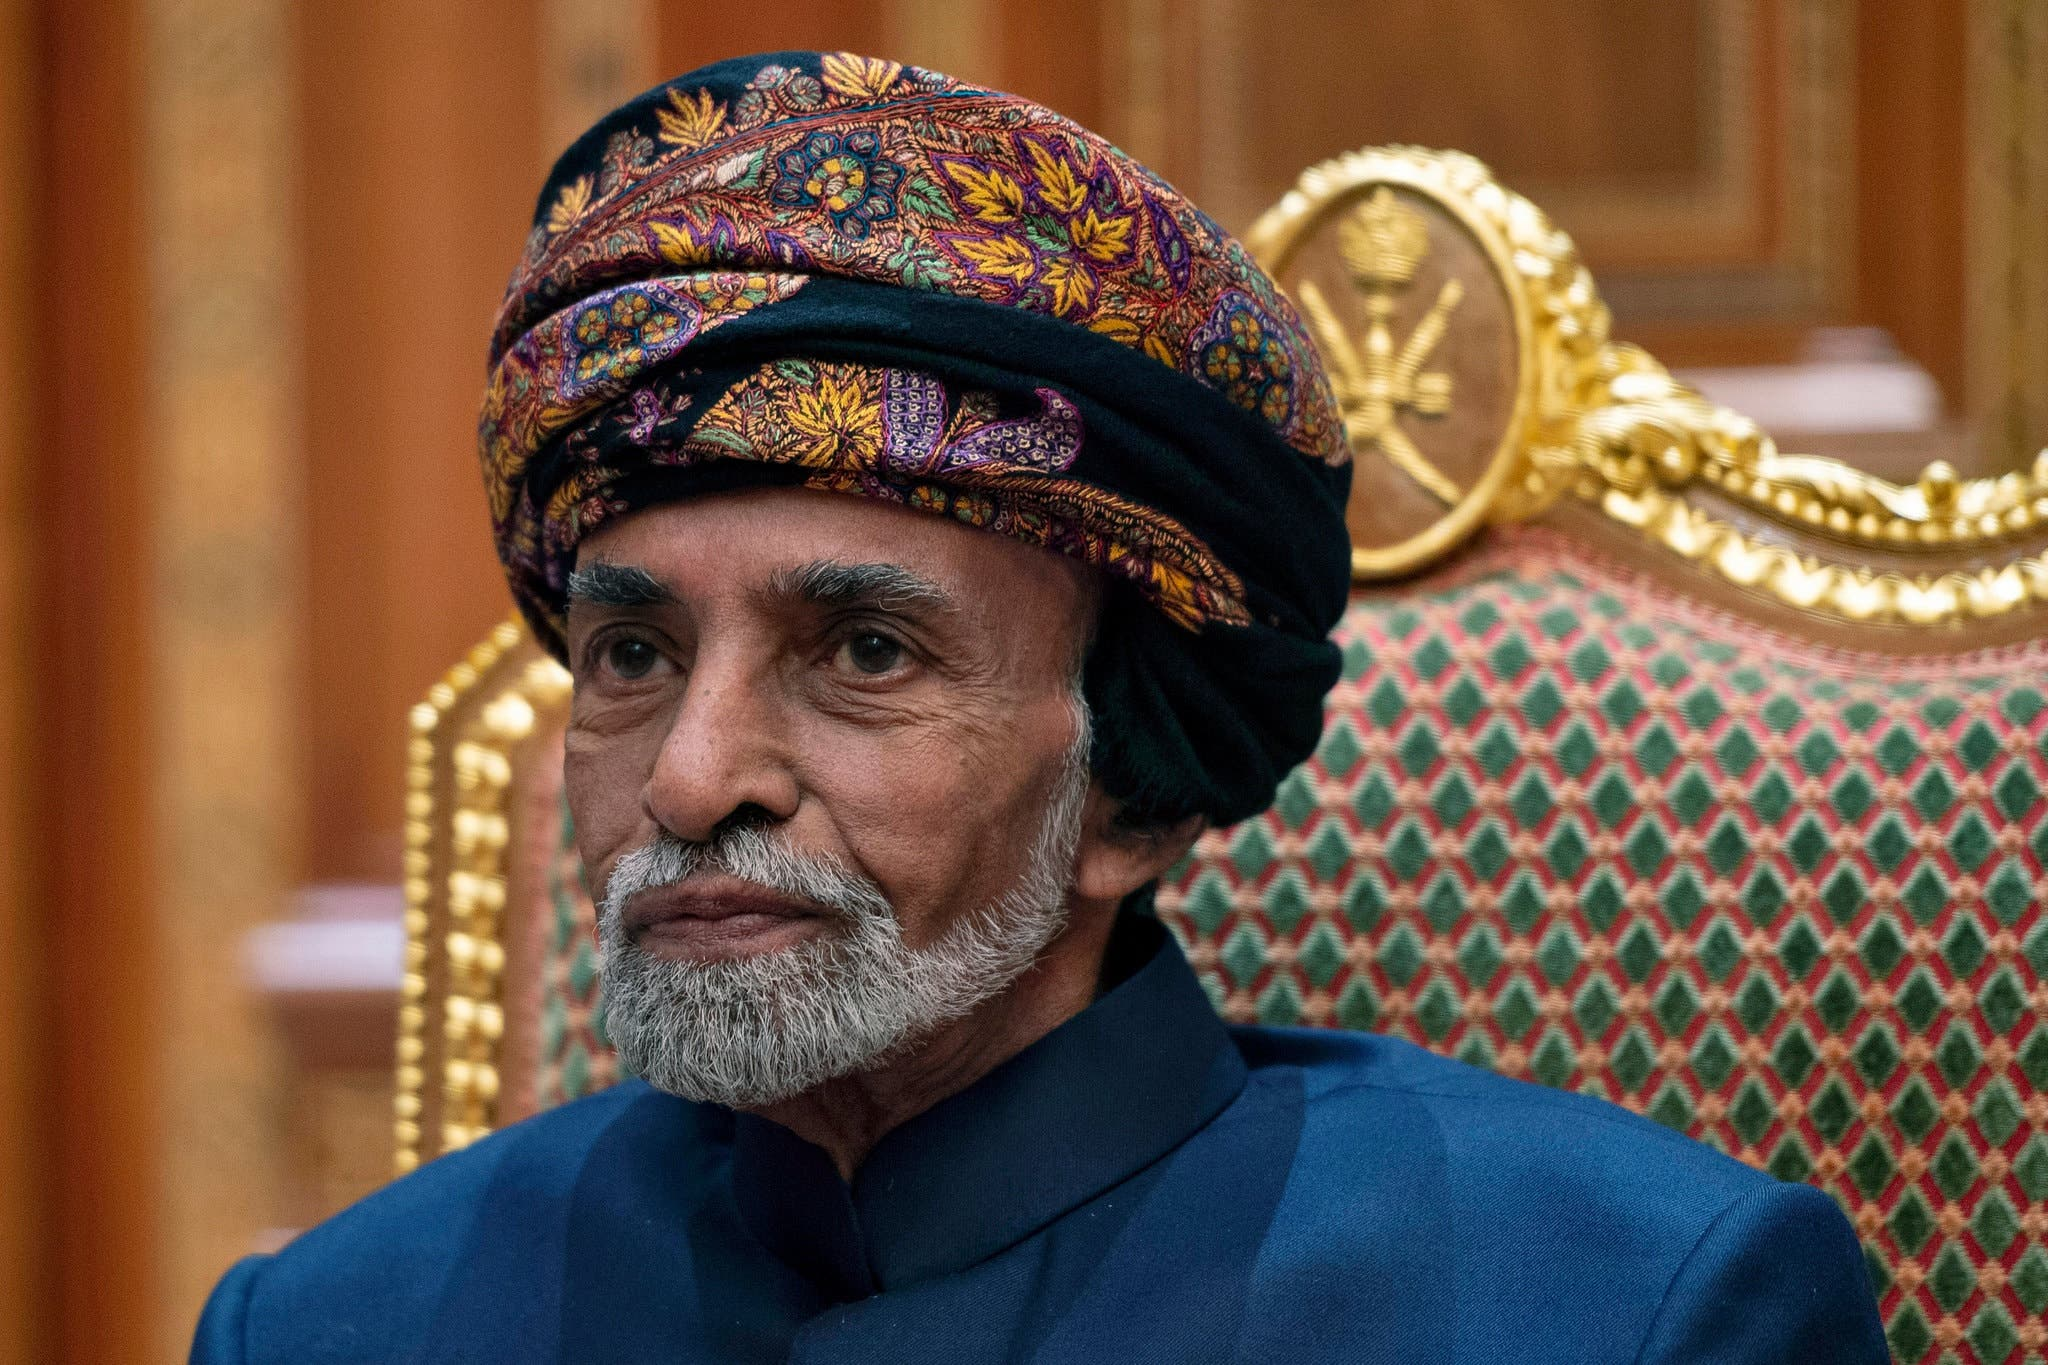 Sultan Qaboos bin Said Al Said of Oman dies aged 79